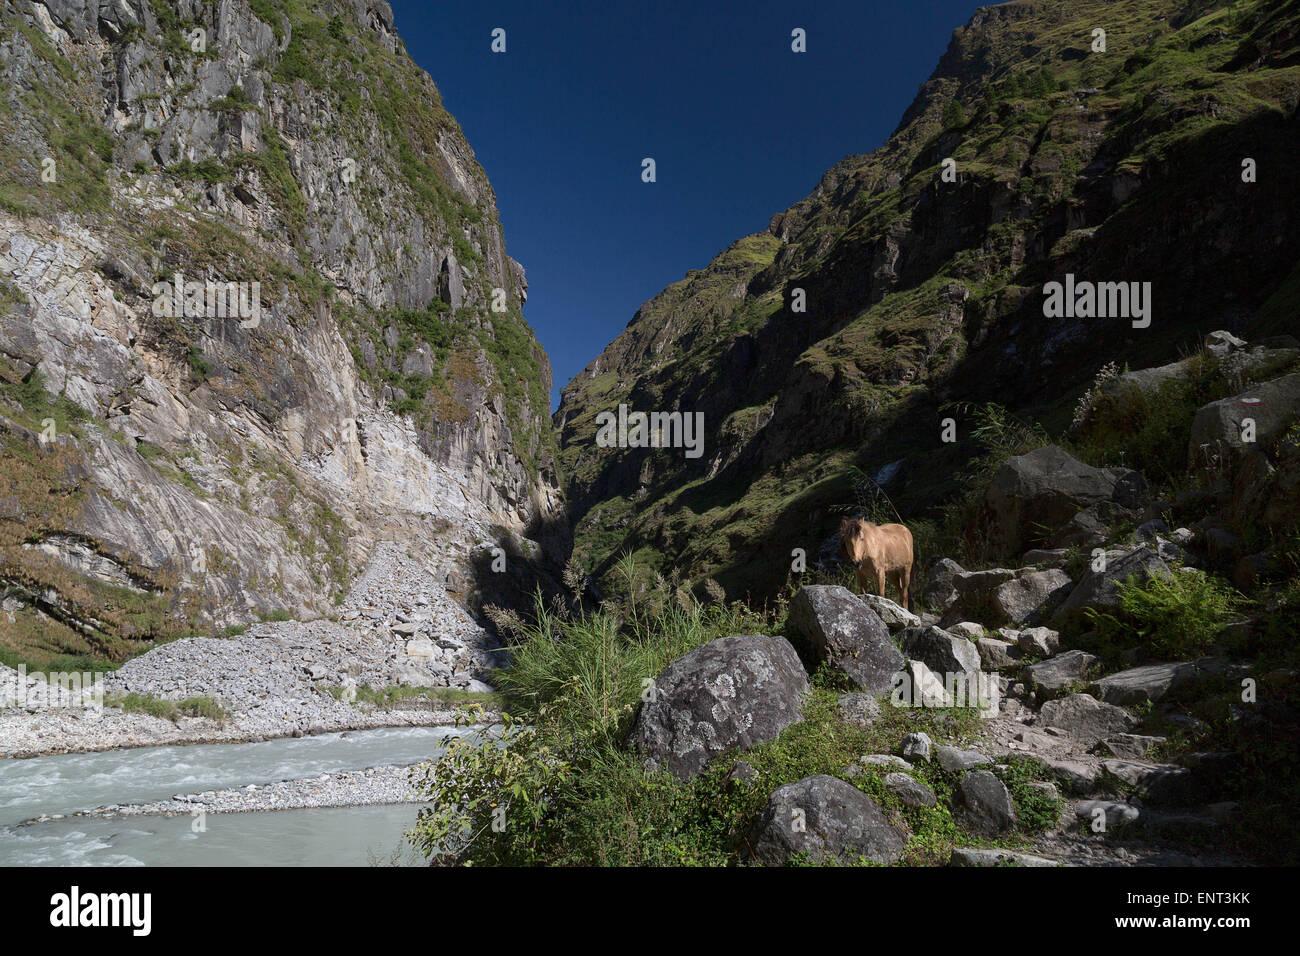 Horse on the Annapurna Circuit Trek, Nepal - Stock Image